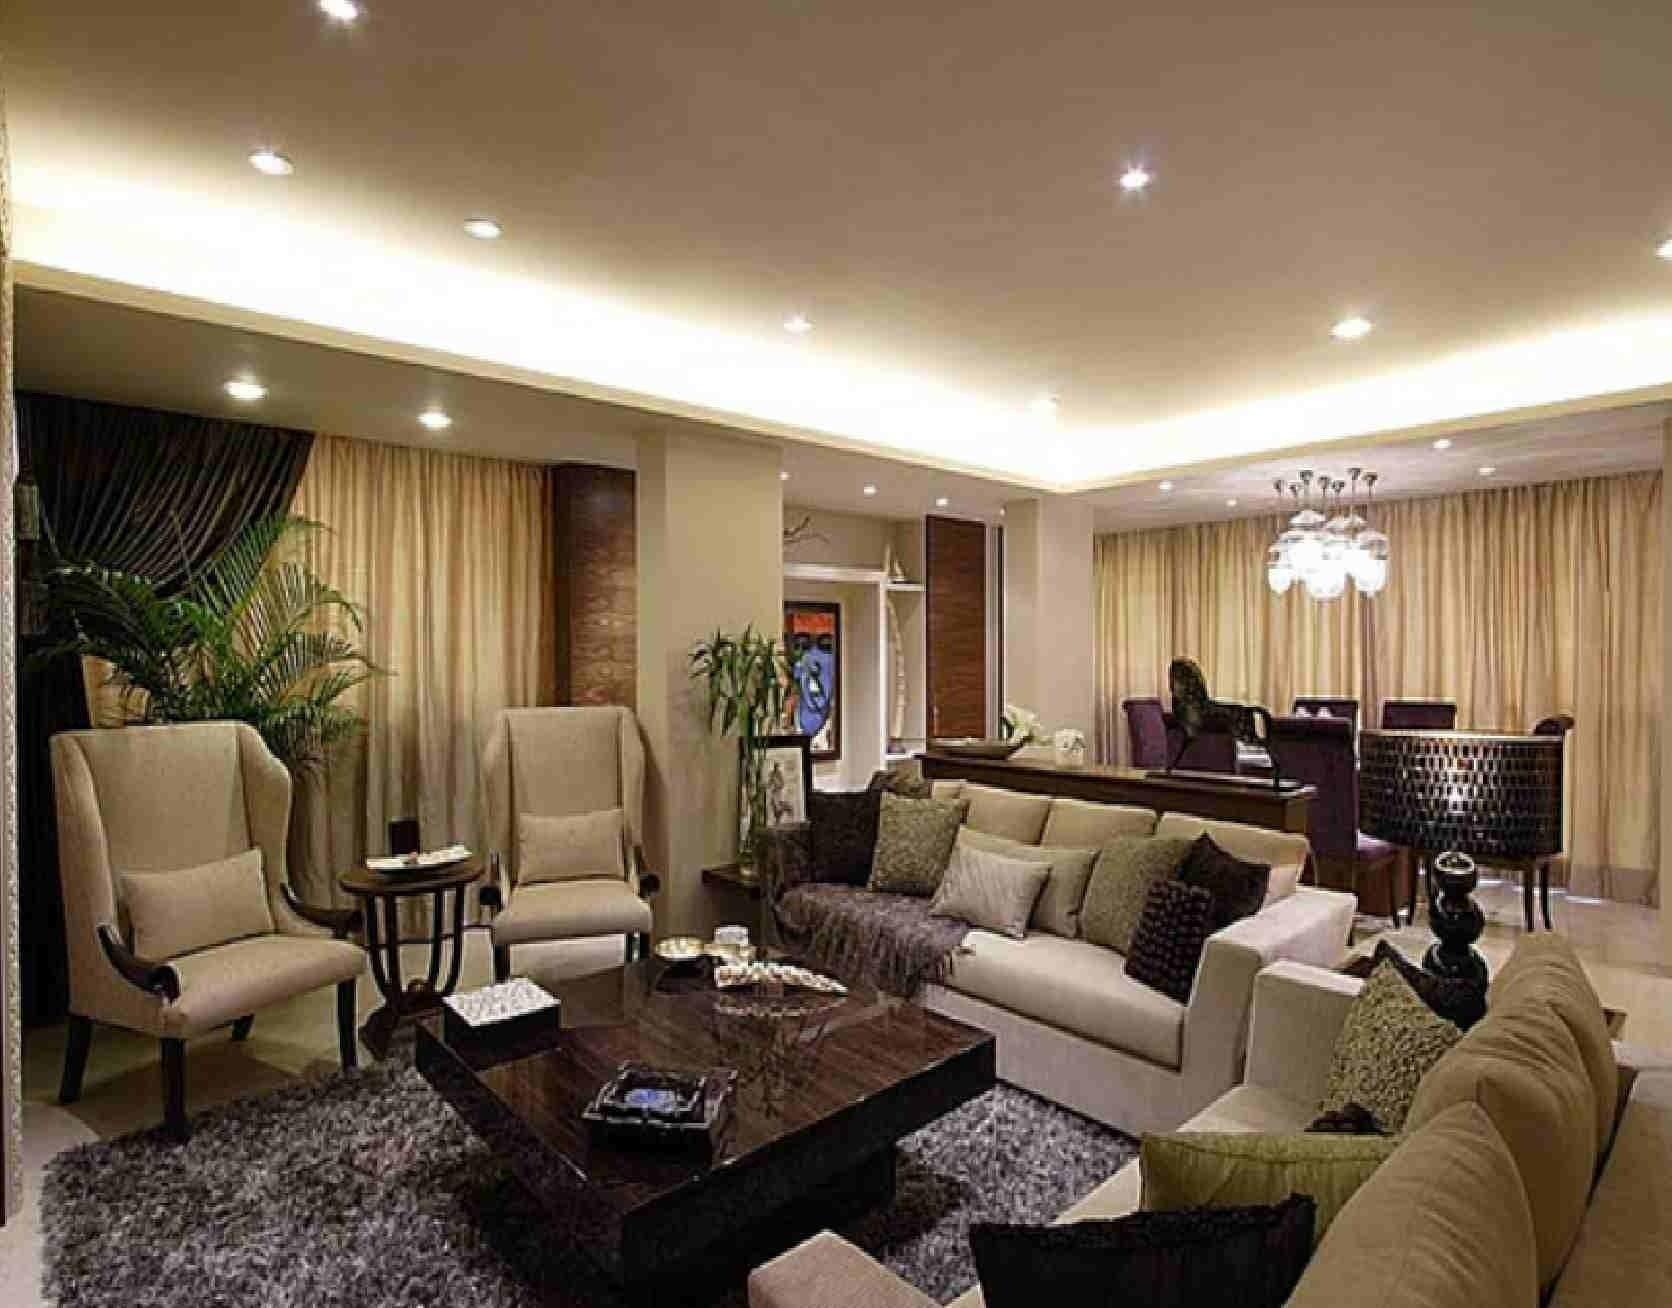 10 Elegant Large Living Room Design Ideas luxury living room furniture arrangement for large and with splendid 2021